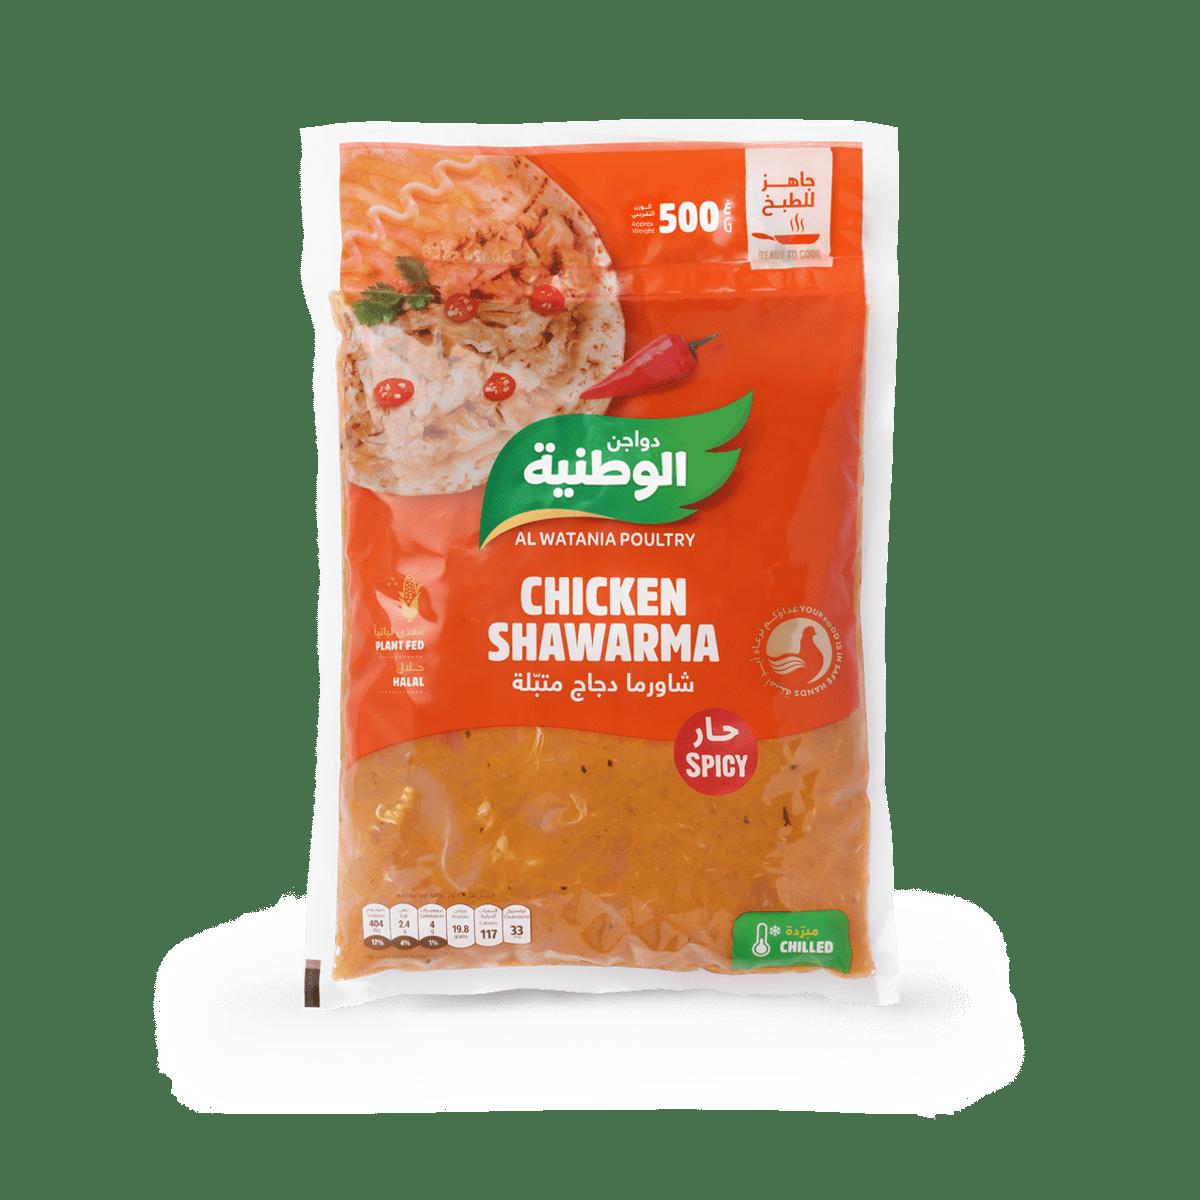 Spicy Chicken Shawarma